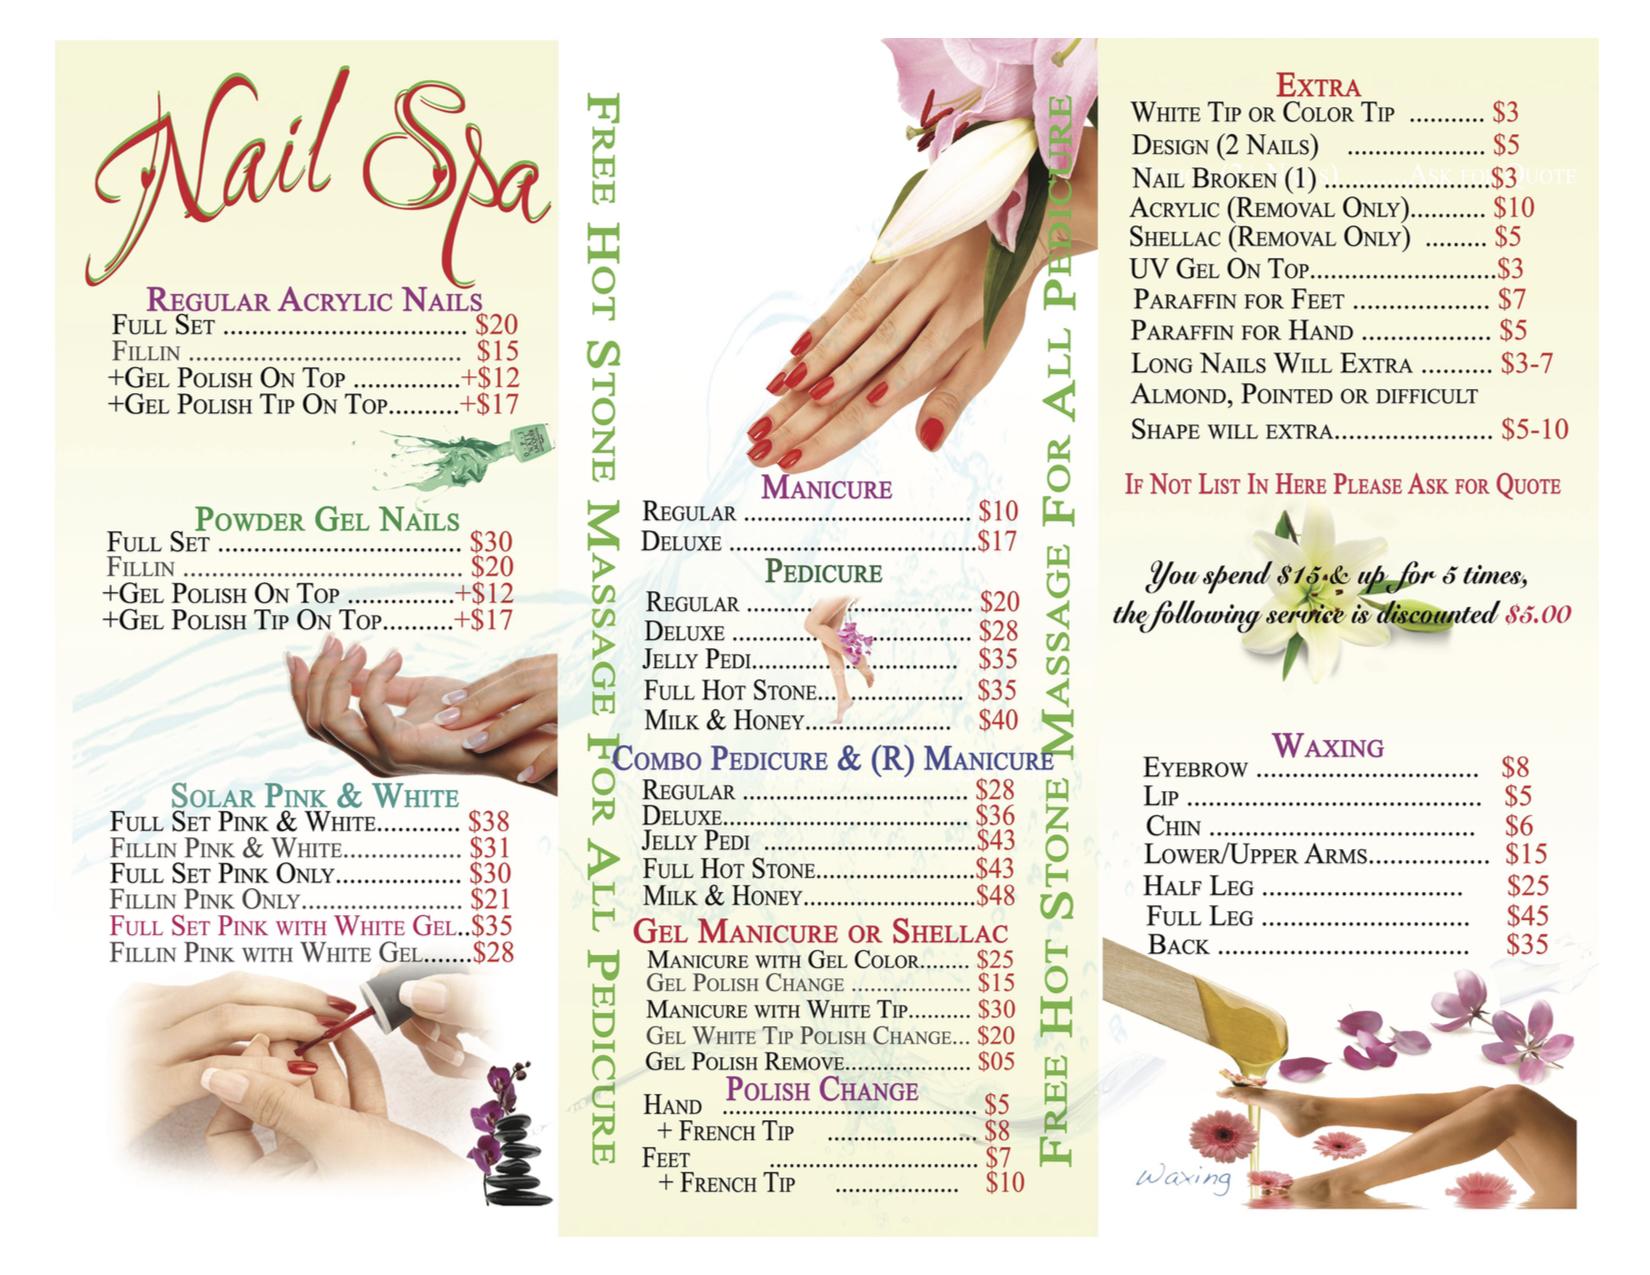 Nail spa salon price list for Acrylic nail salon prices